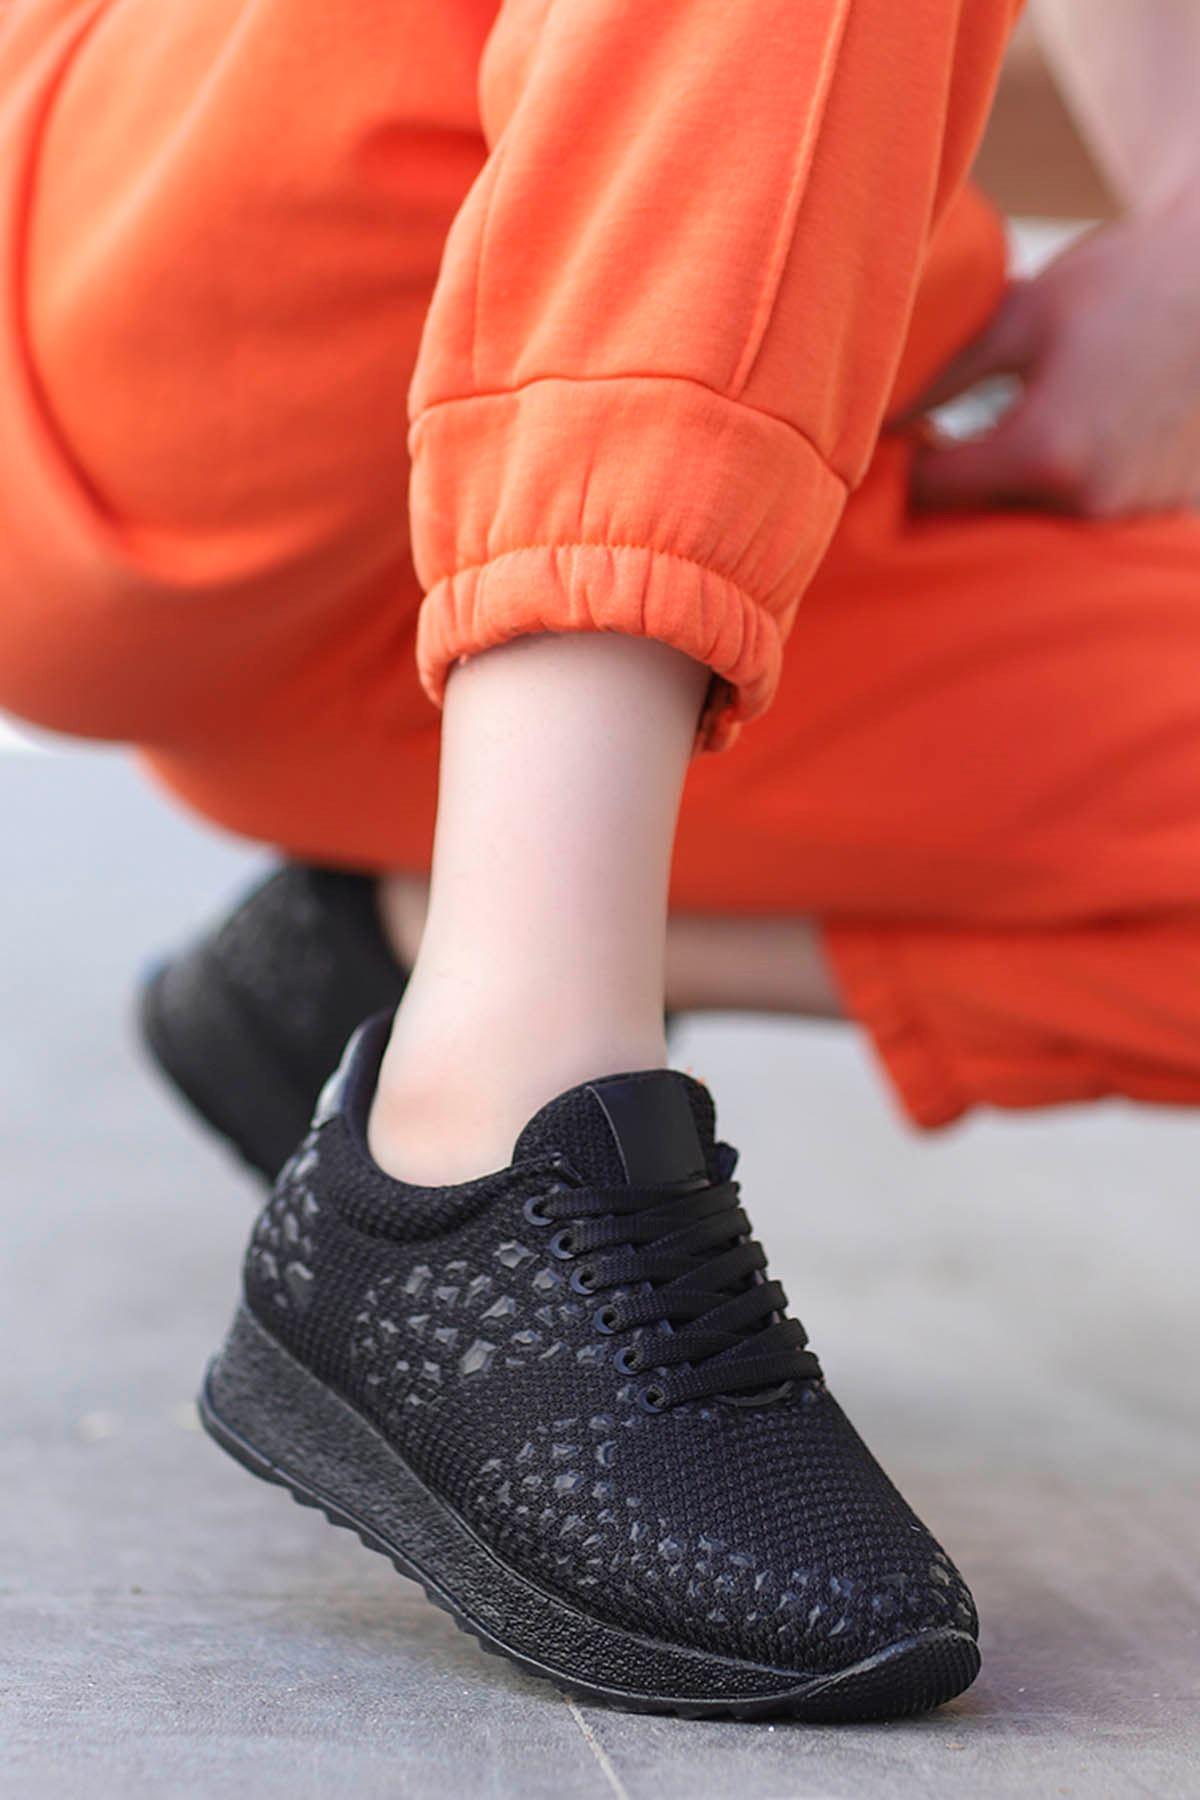 Della Siyah Triko Spor Ayakkabı